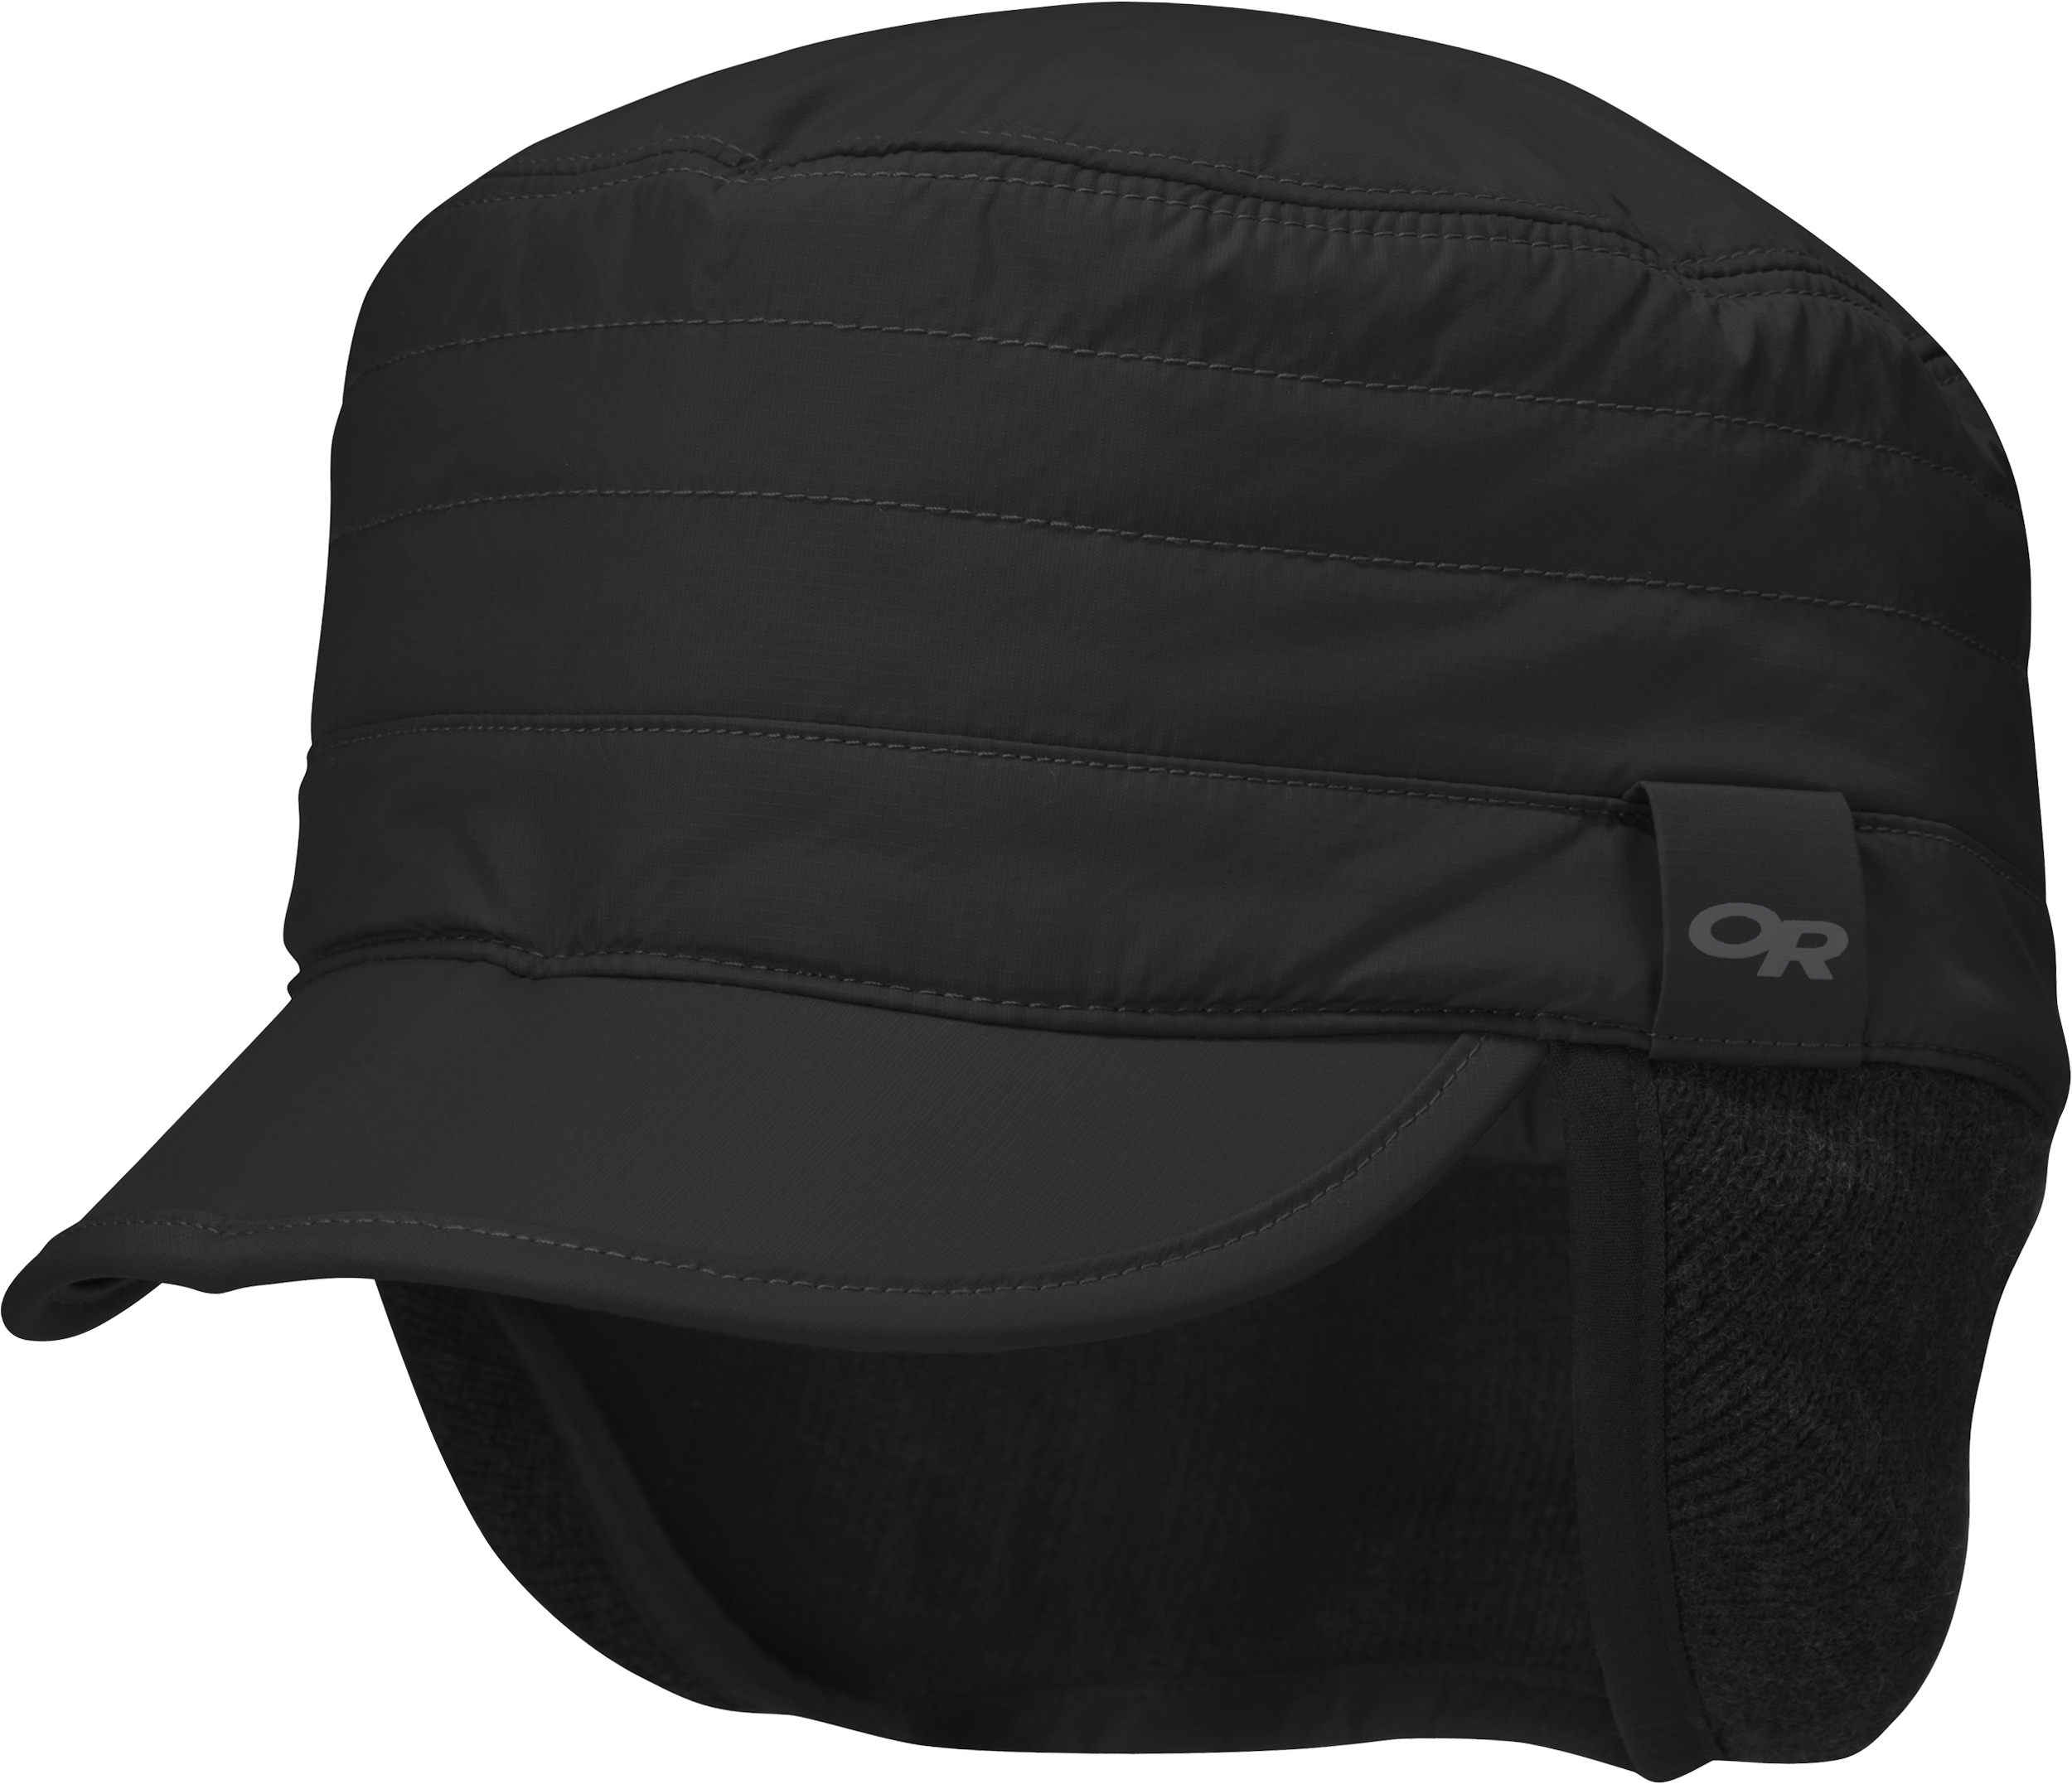 070bc52cf82 Women s Winter hats